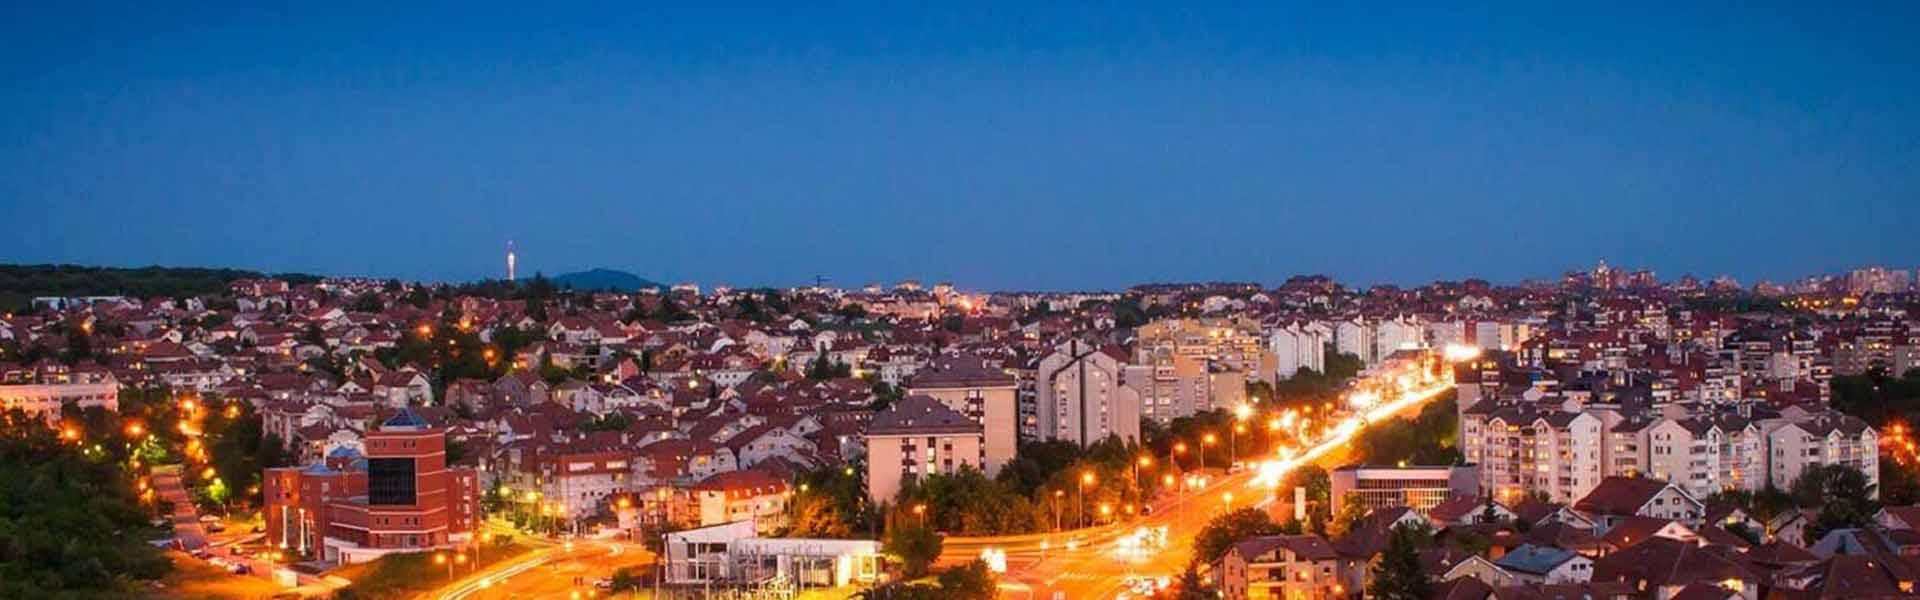 Dostava hrane Žarkovo | Beograd